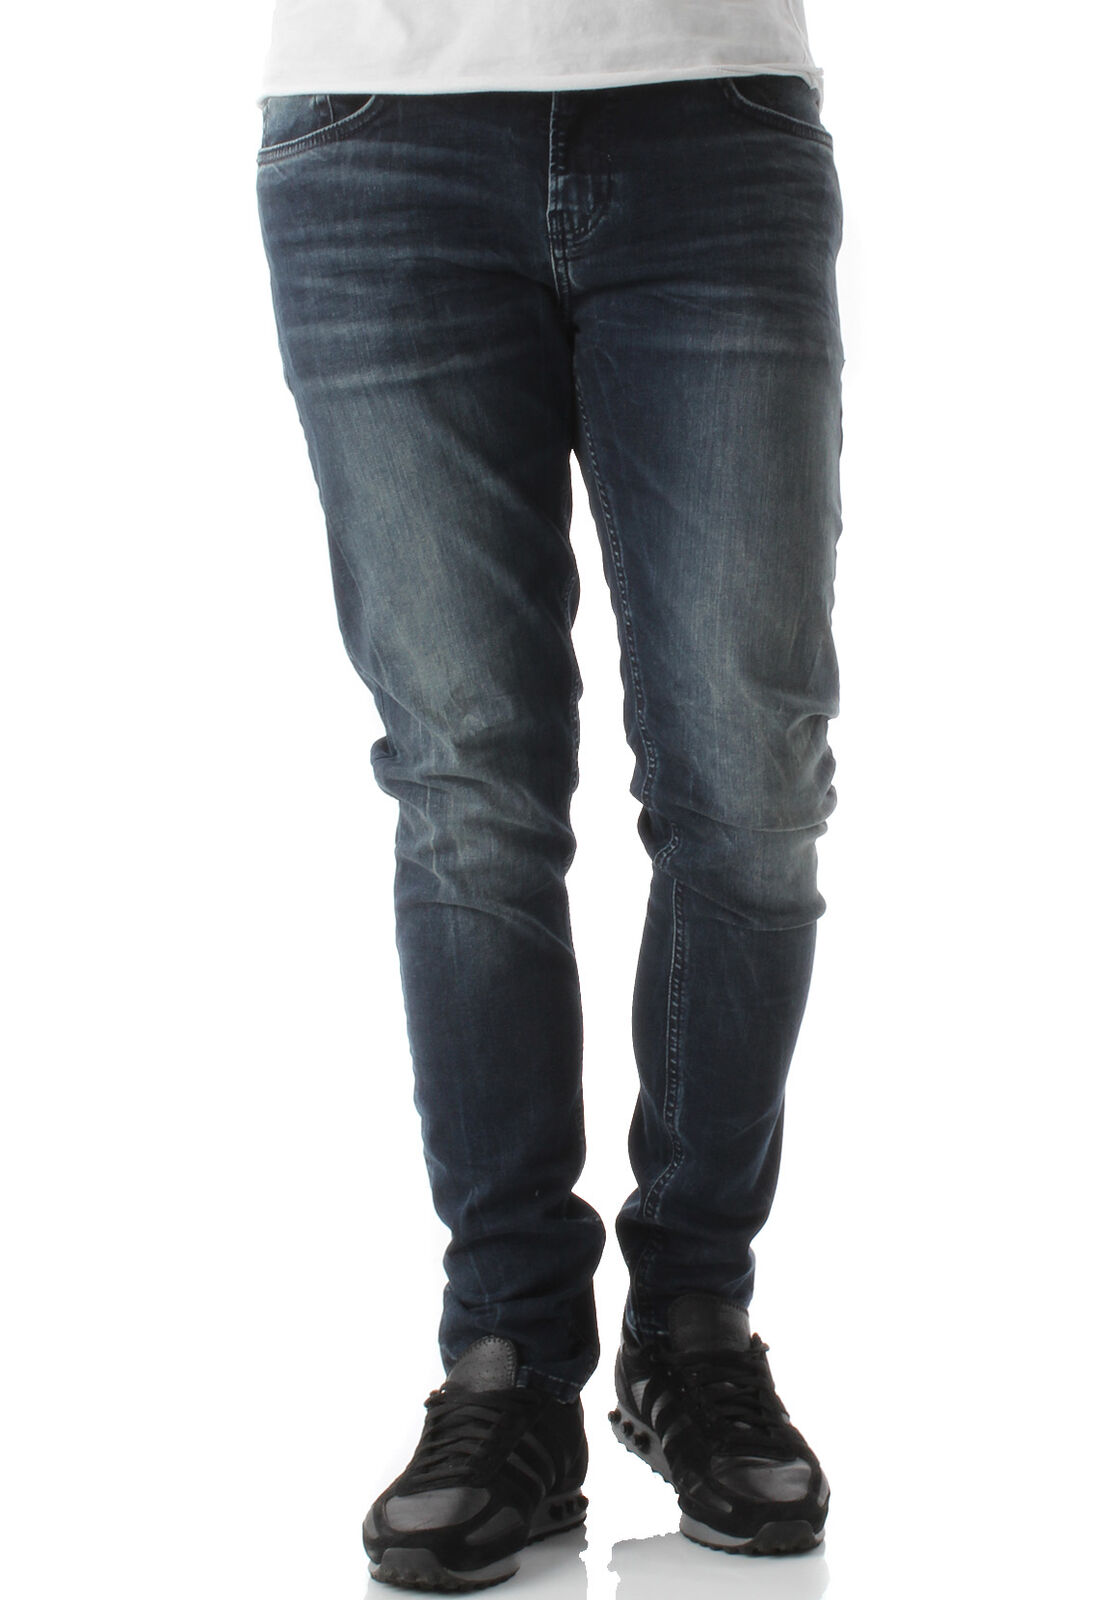 Ltb Men's Jeans Smarty Alpha Wash Dark bluee